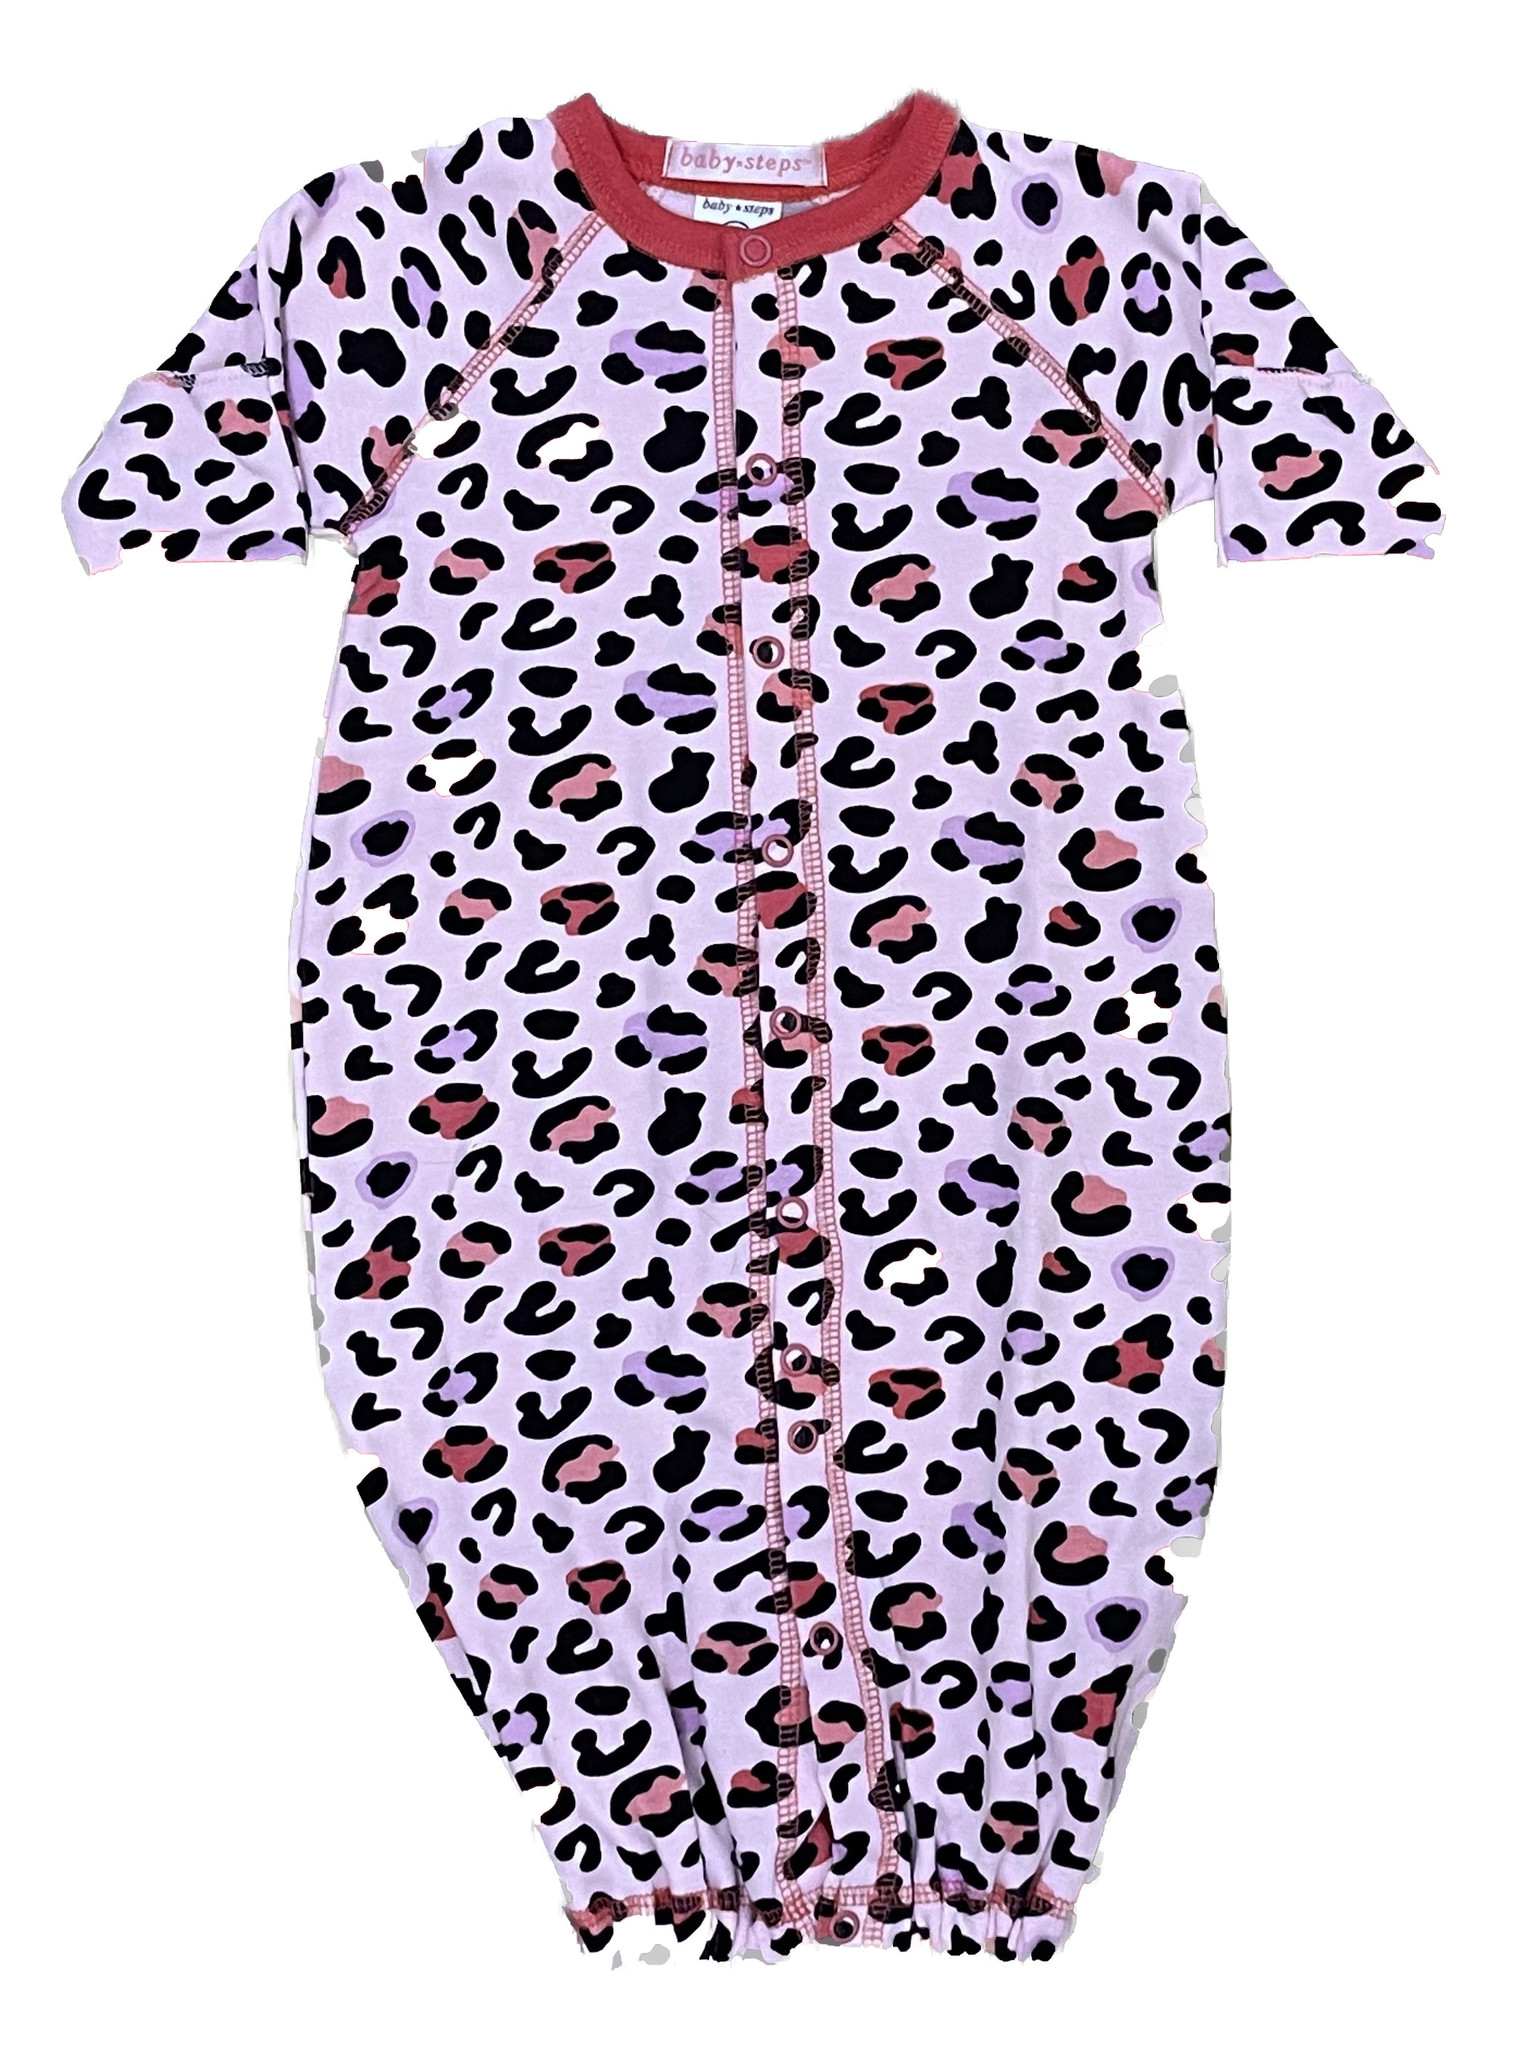 Baby Steps Pink/Purple Cheetah Converter Gown